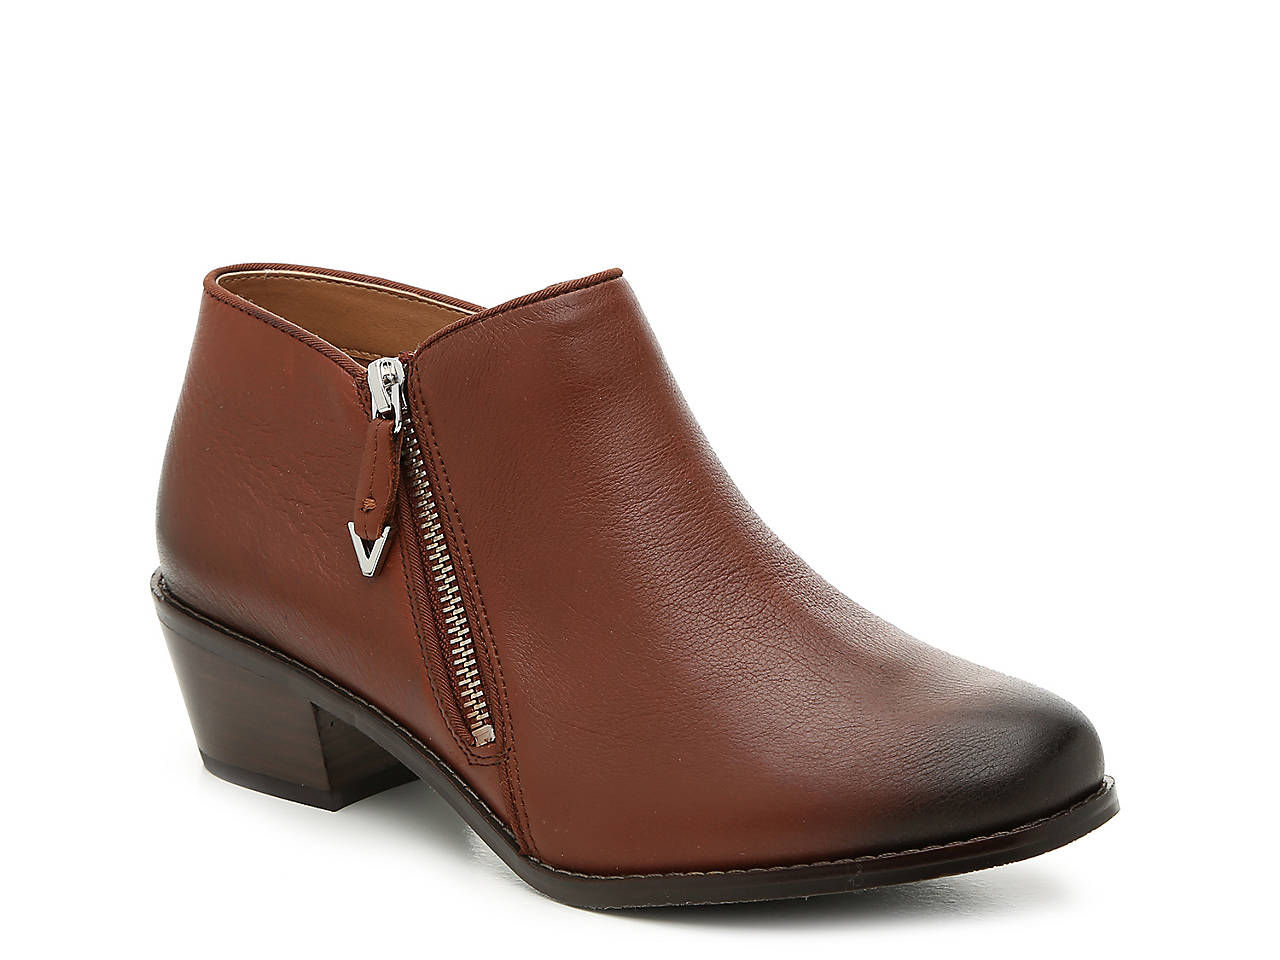 a2ee8e7b22a Vionic Jolene Bootie Women s Shoes